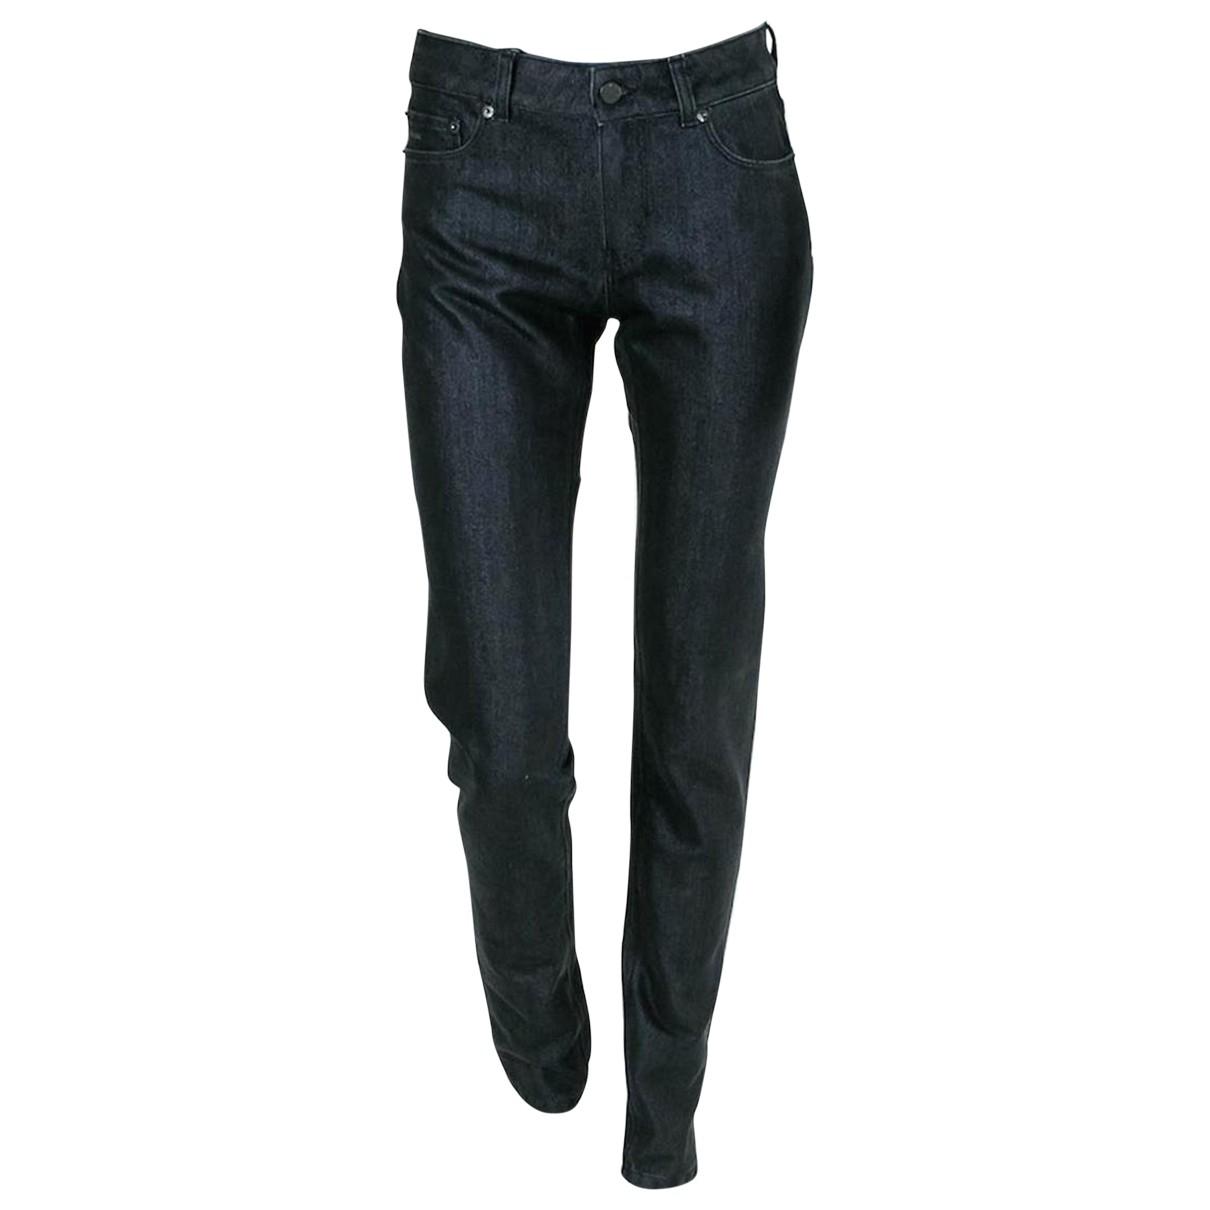 Prada N Navy Denim - Jeans Jeans for Women 26 US